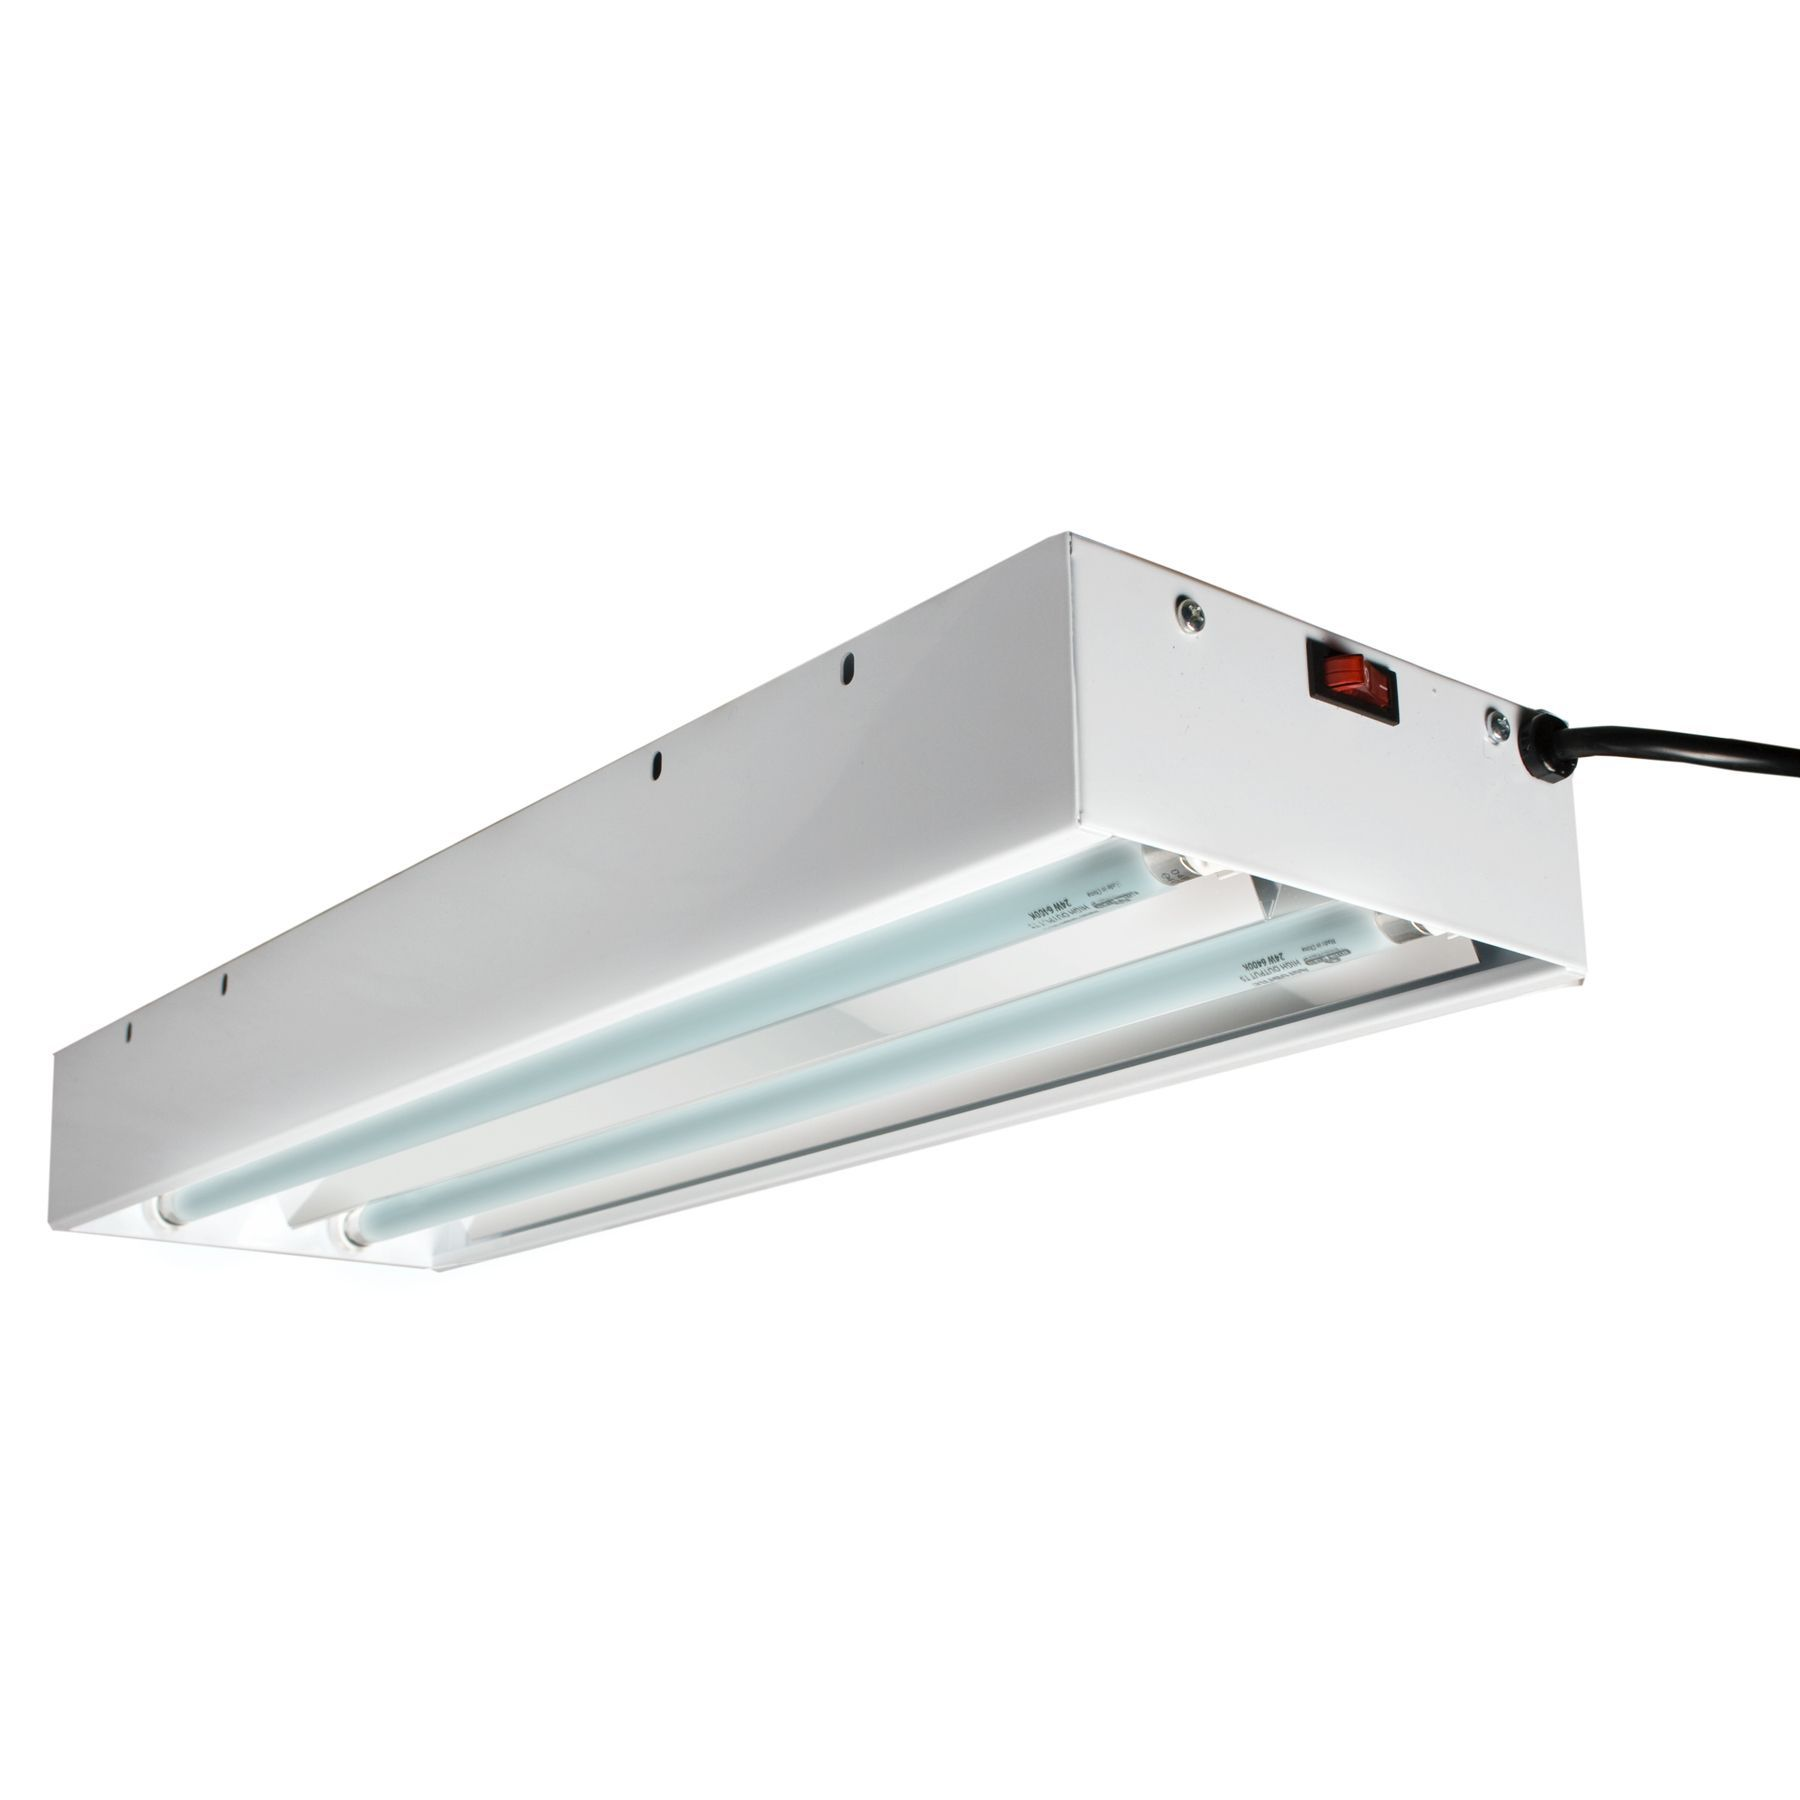 tube light lamp product china fluorescent wszedgqkirho